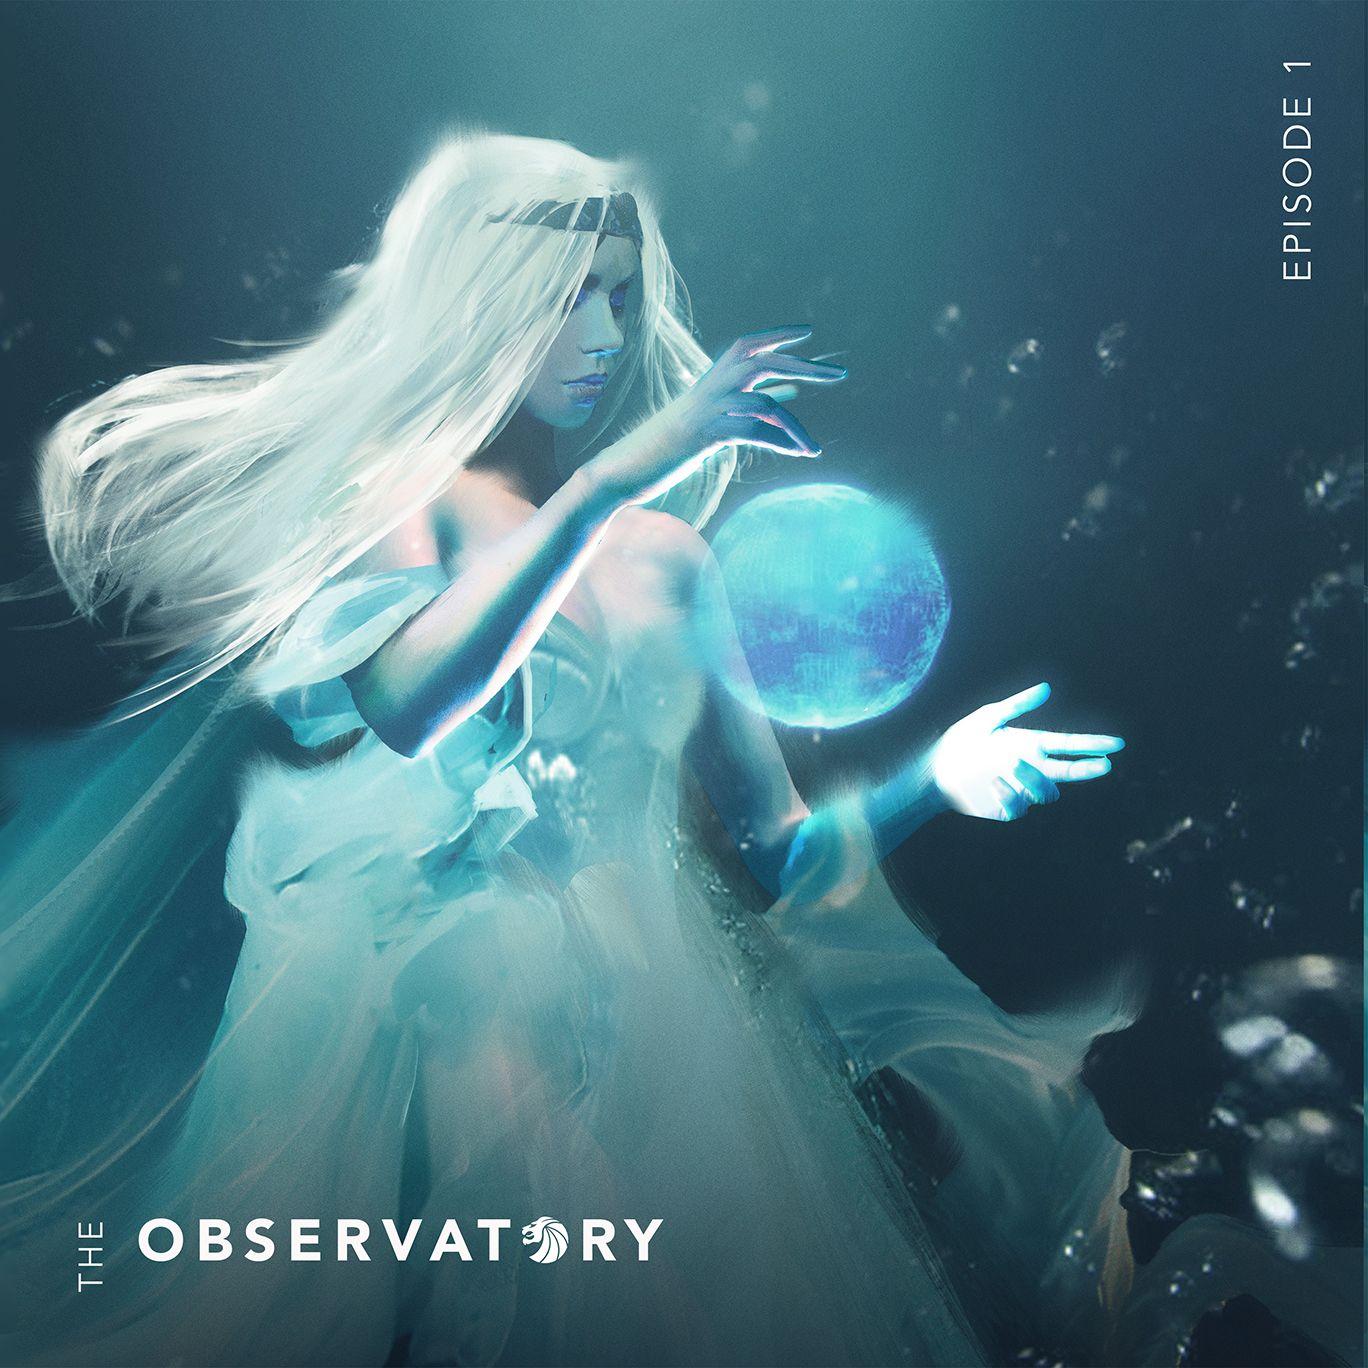 observatory2_1.jpg